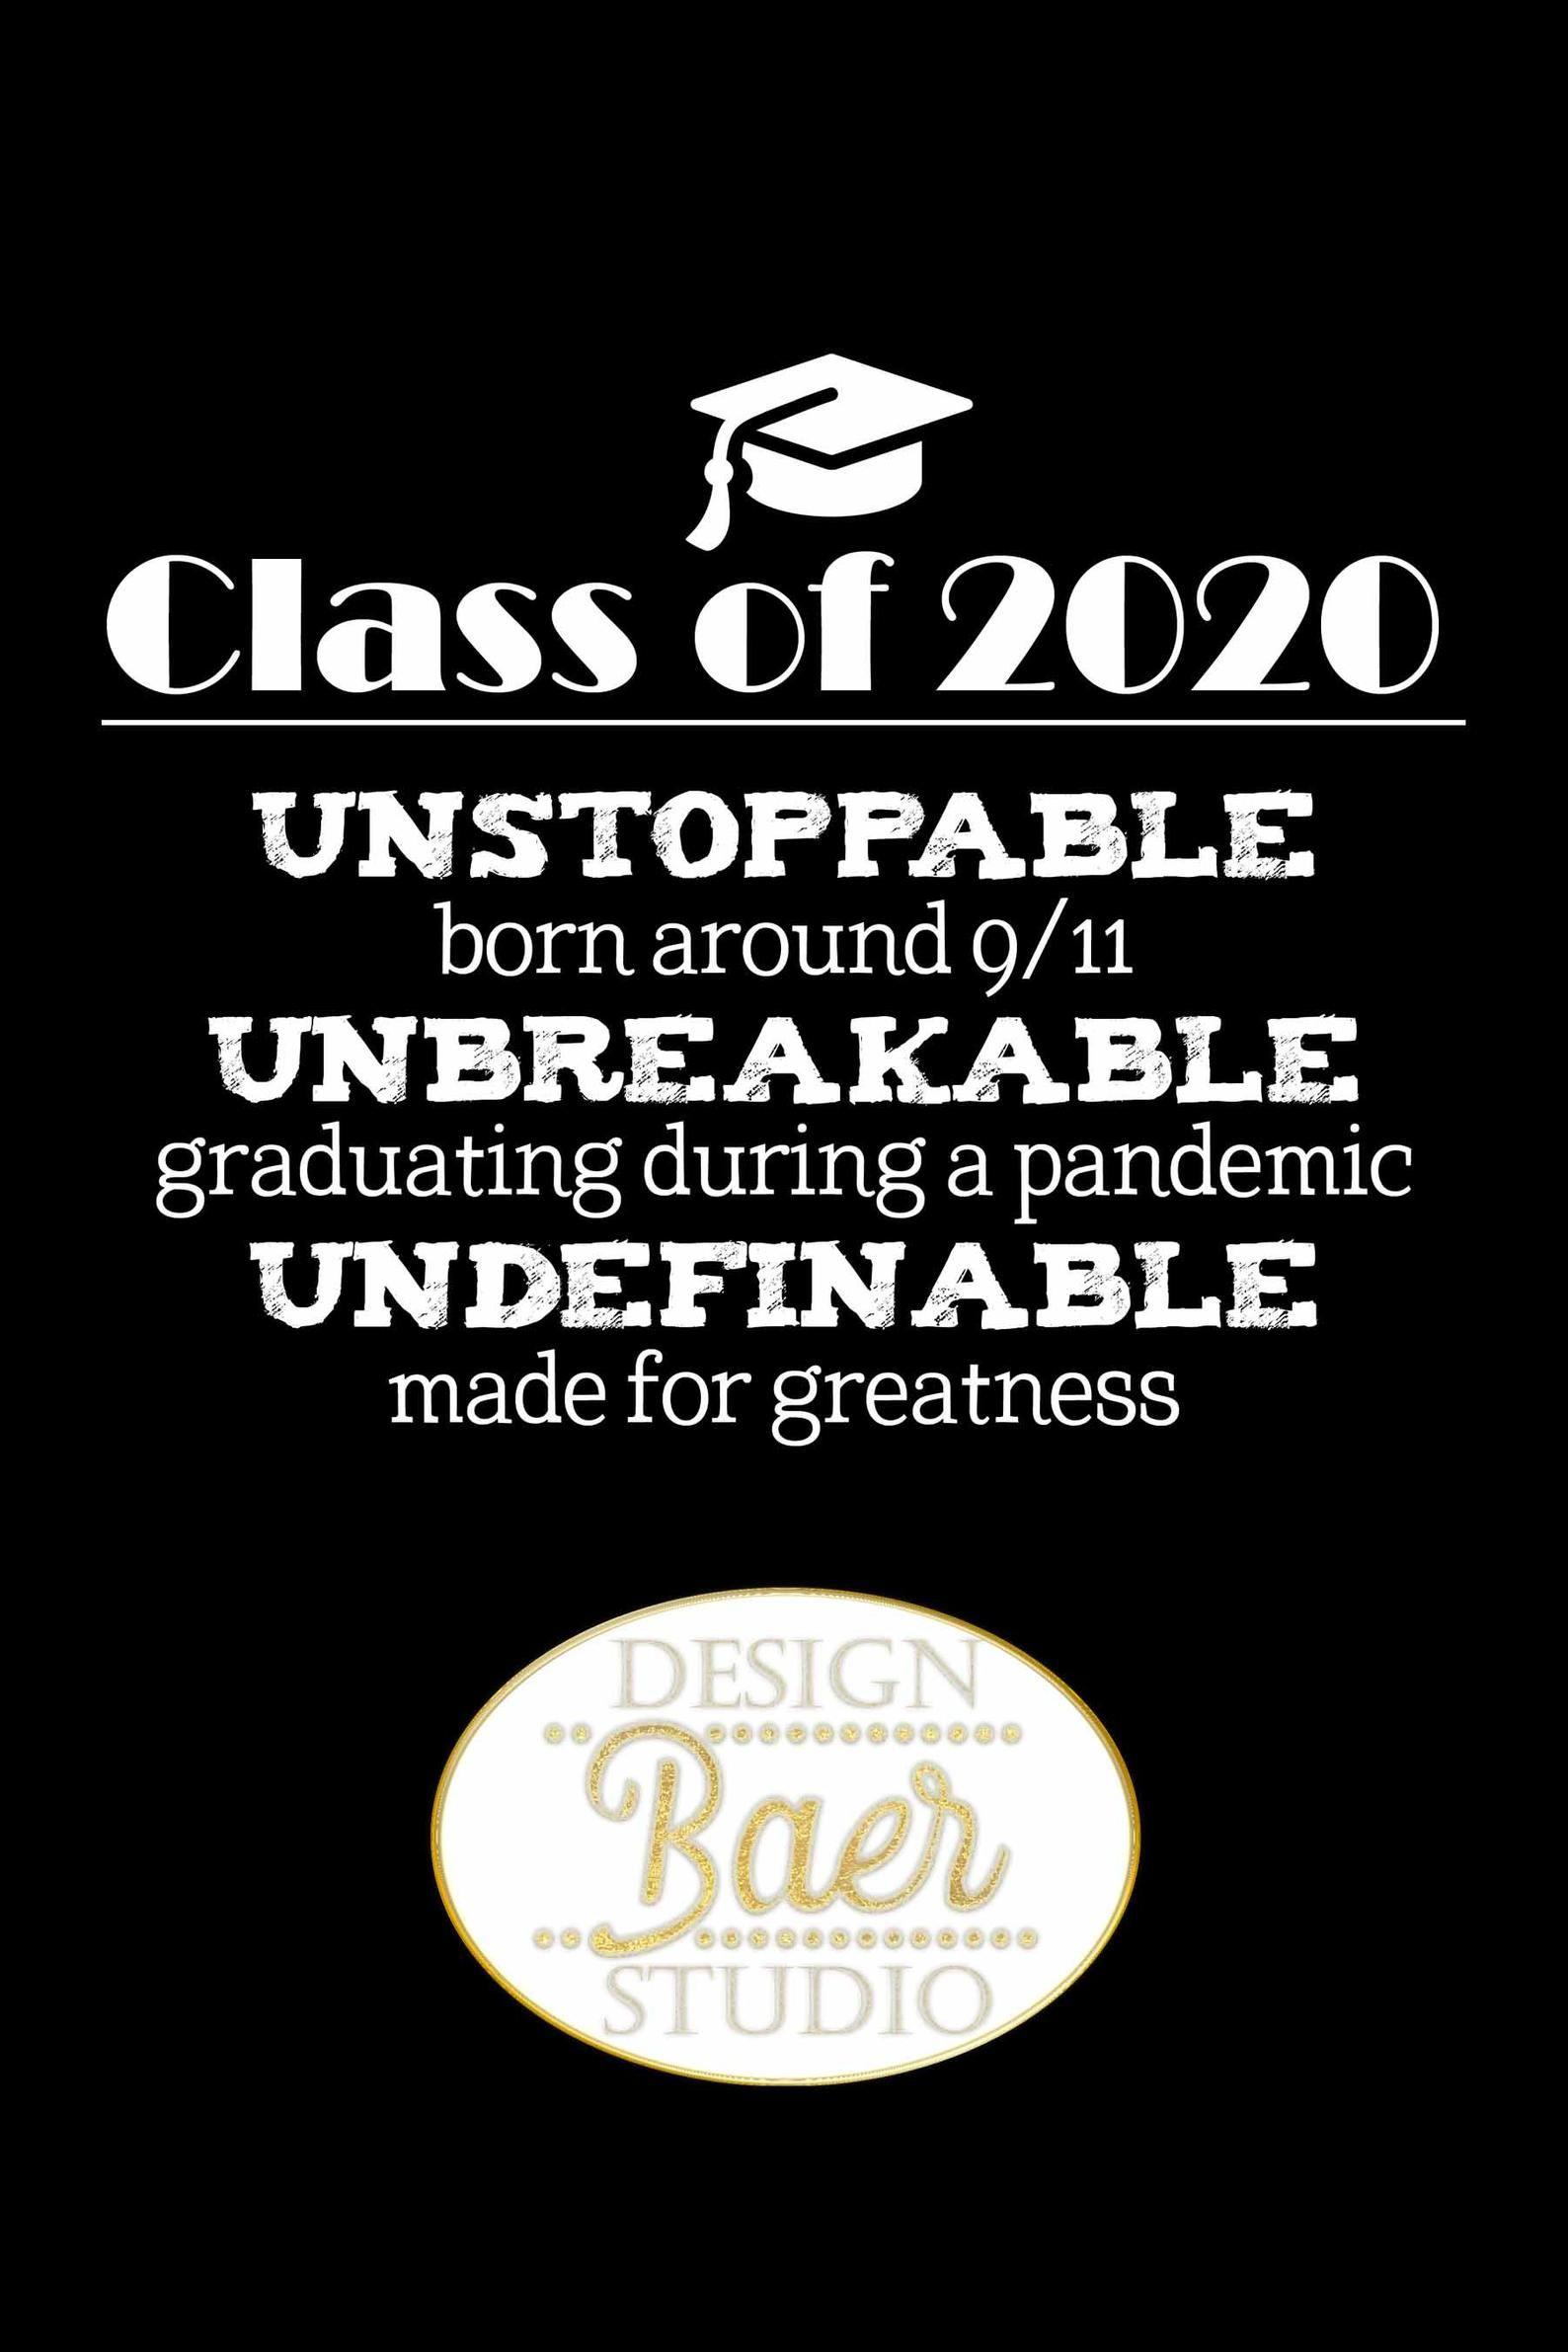 Class Of 2021 Clipart Graduation Quotes Graduation Overlays Graduation Clip Art Class Of 2021 Photo Overlays Class Of 2021 Quotes 42920 Graduation Clip Art Graduation Words Graduation Quotes